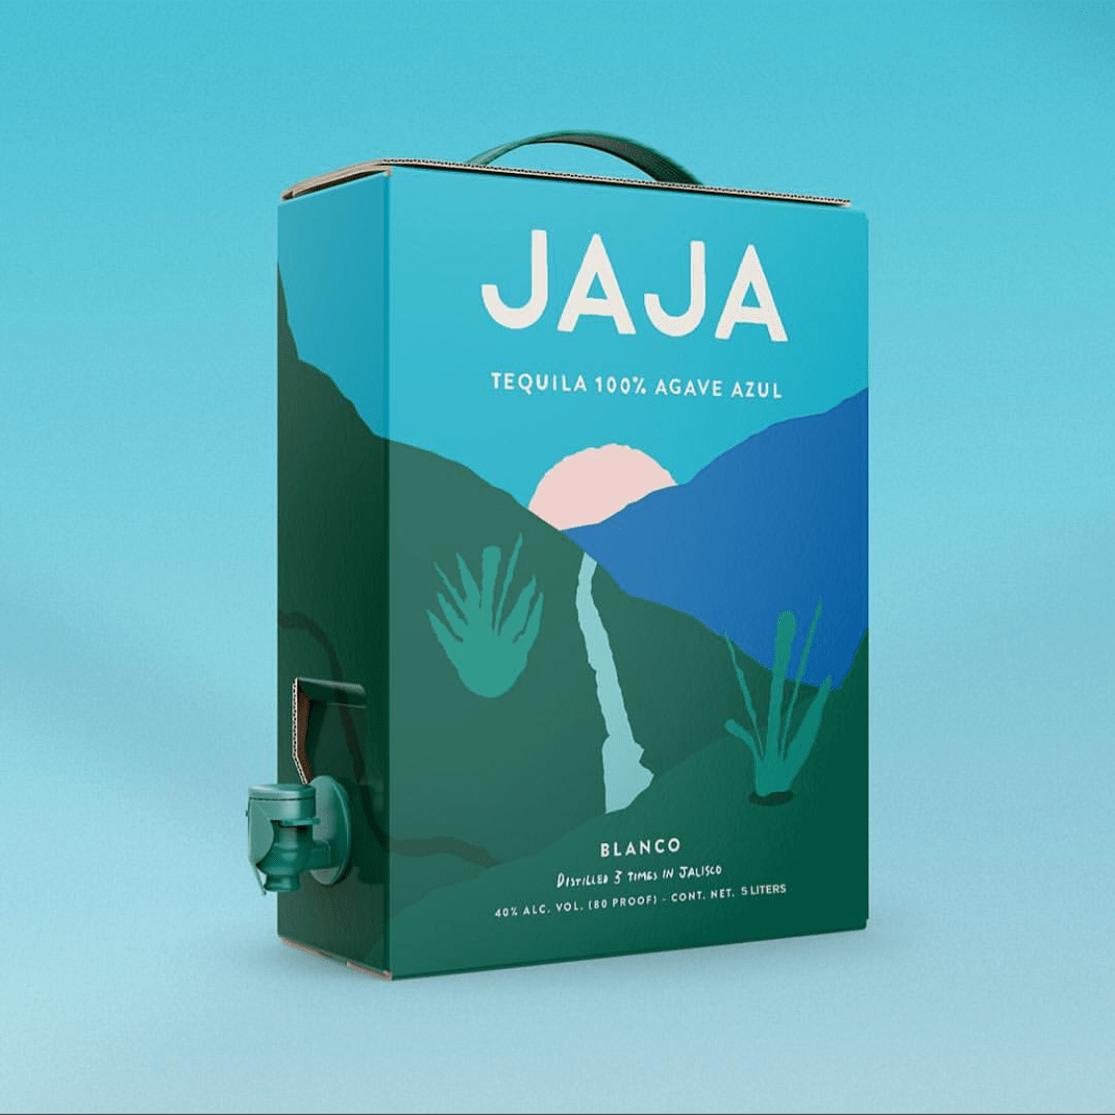 Matthew Haysom Designer JAJA Tequila Brand Identity Packaging Experience Design